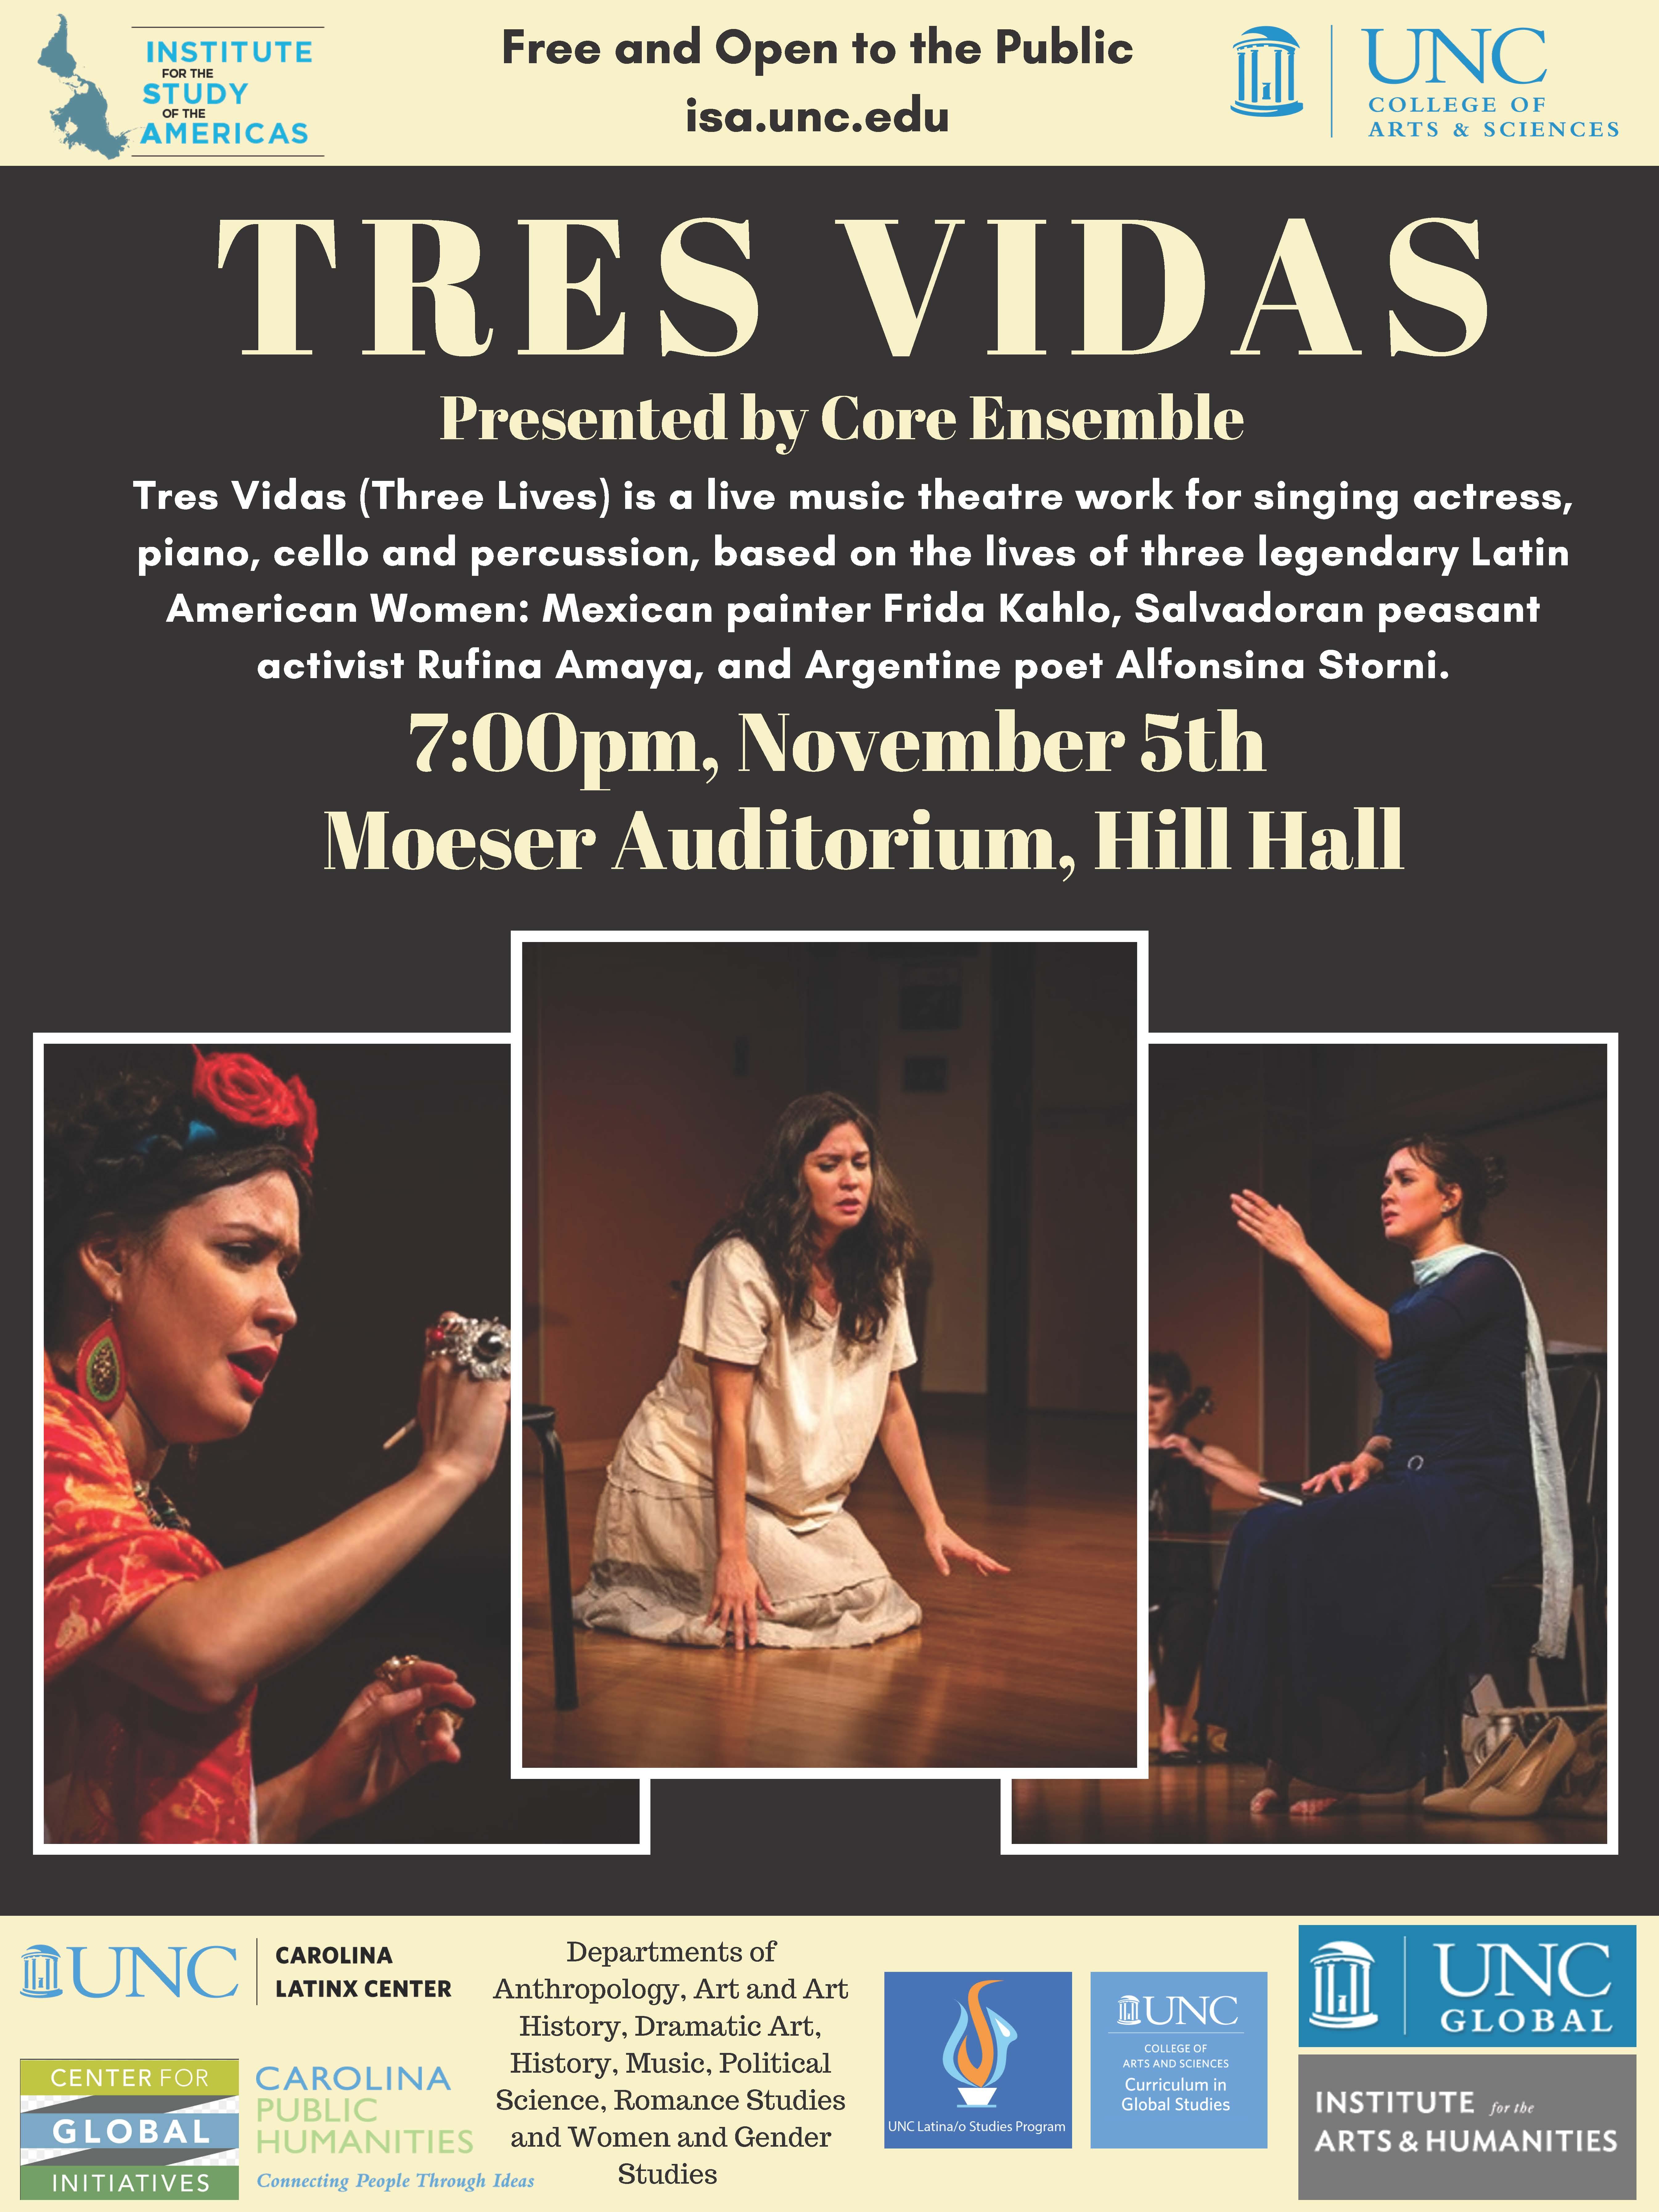 Core Ensemble Performs 'Tres Vidas' Honoring Influential Latin American Women